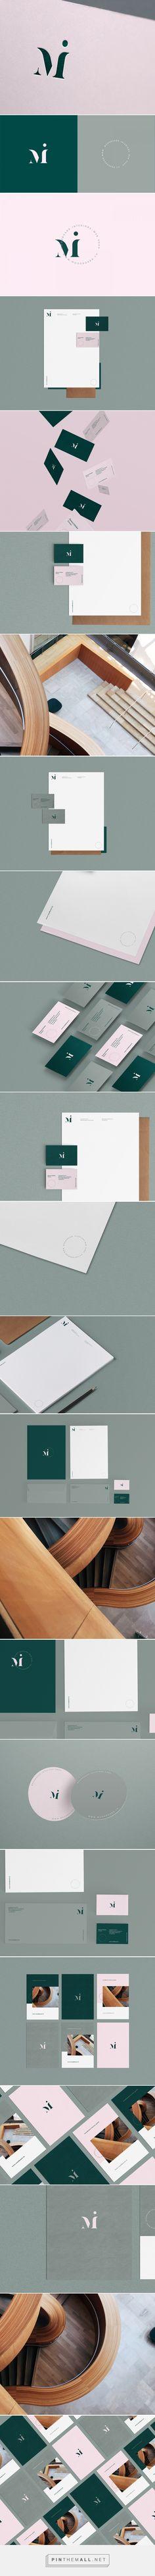 Moodboard Interiors on Behance - created via https://pinthemall.net